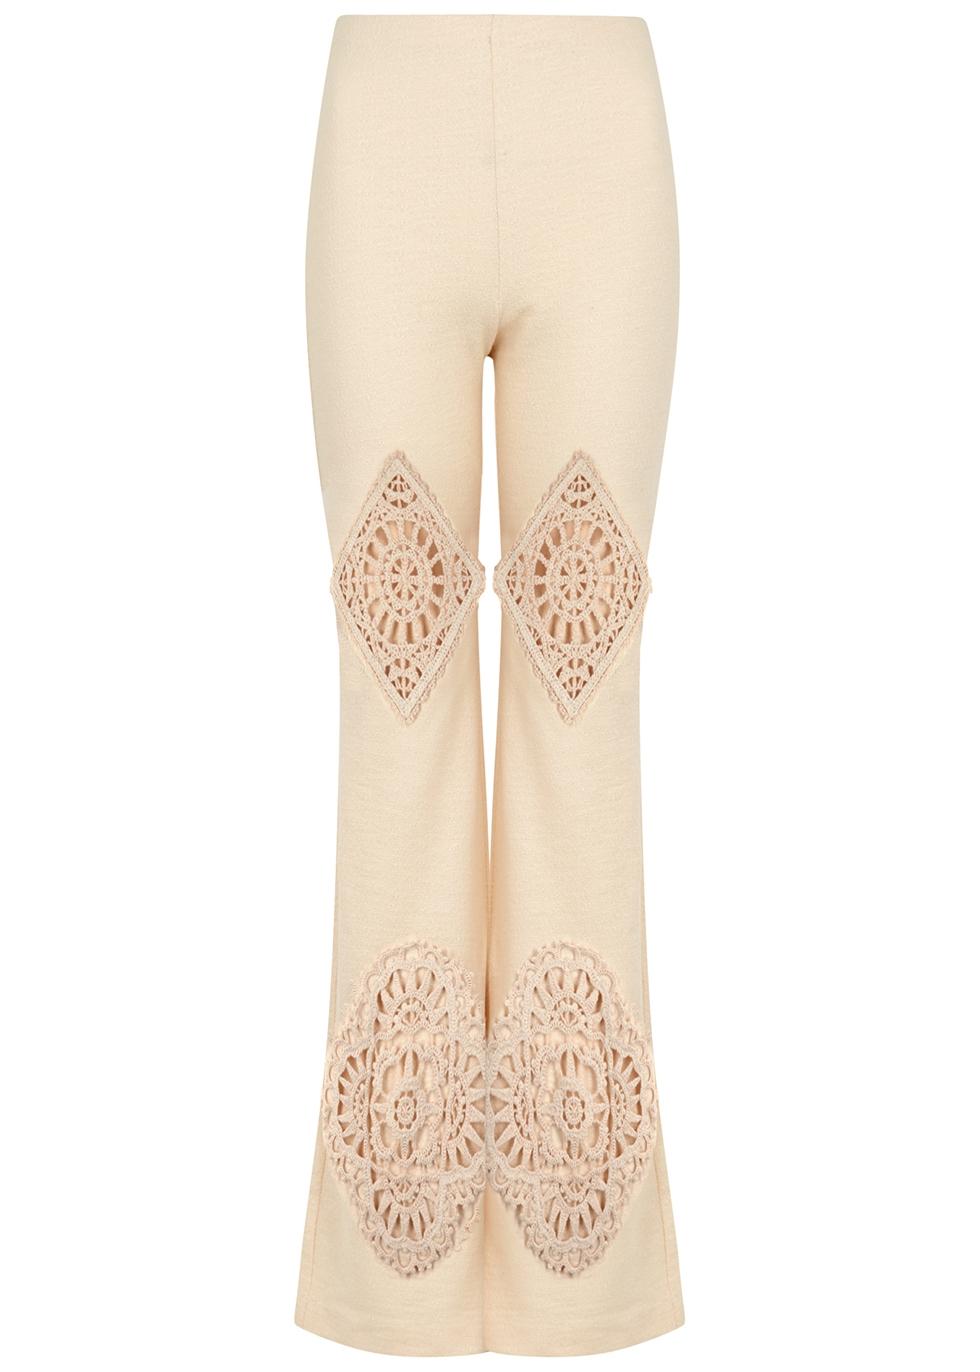 Evelta crochet-trimmed cotton-blend trousers